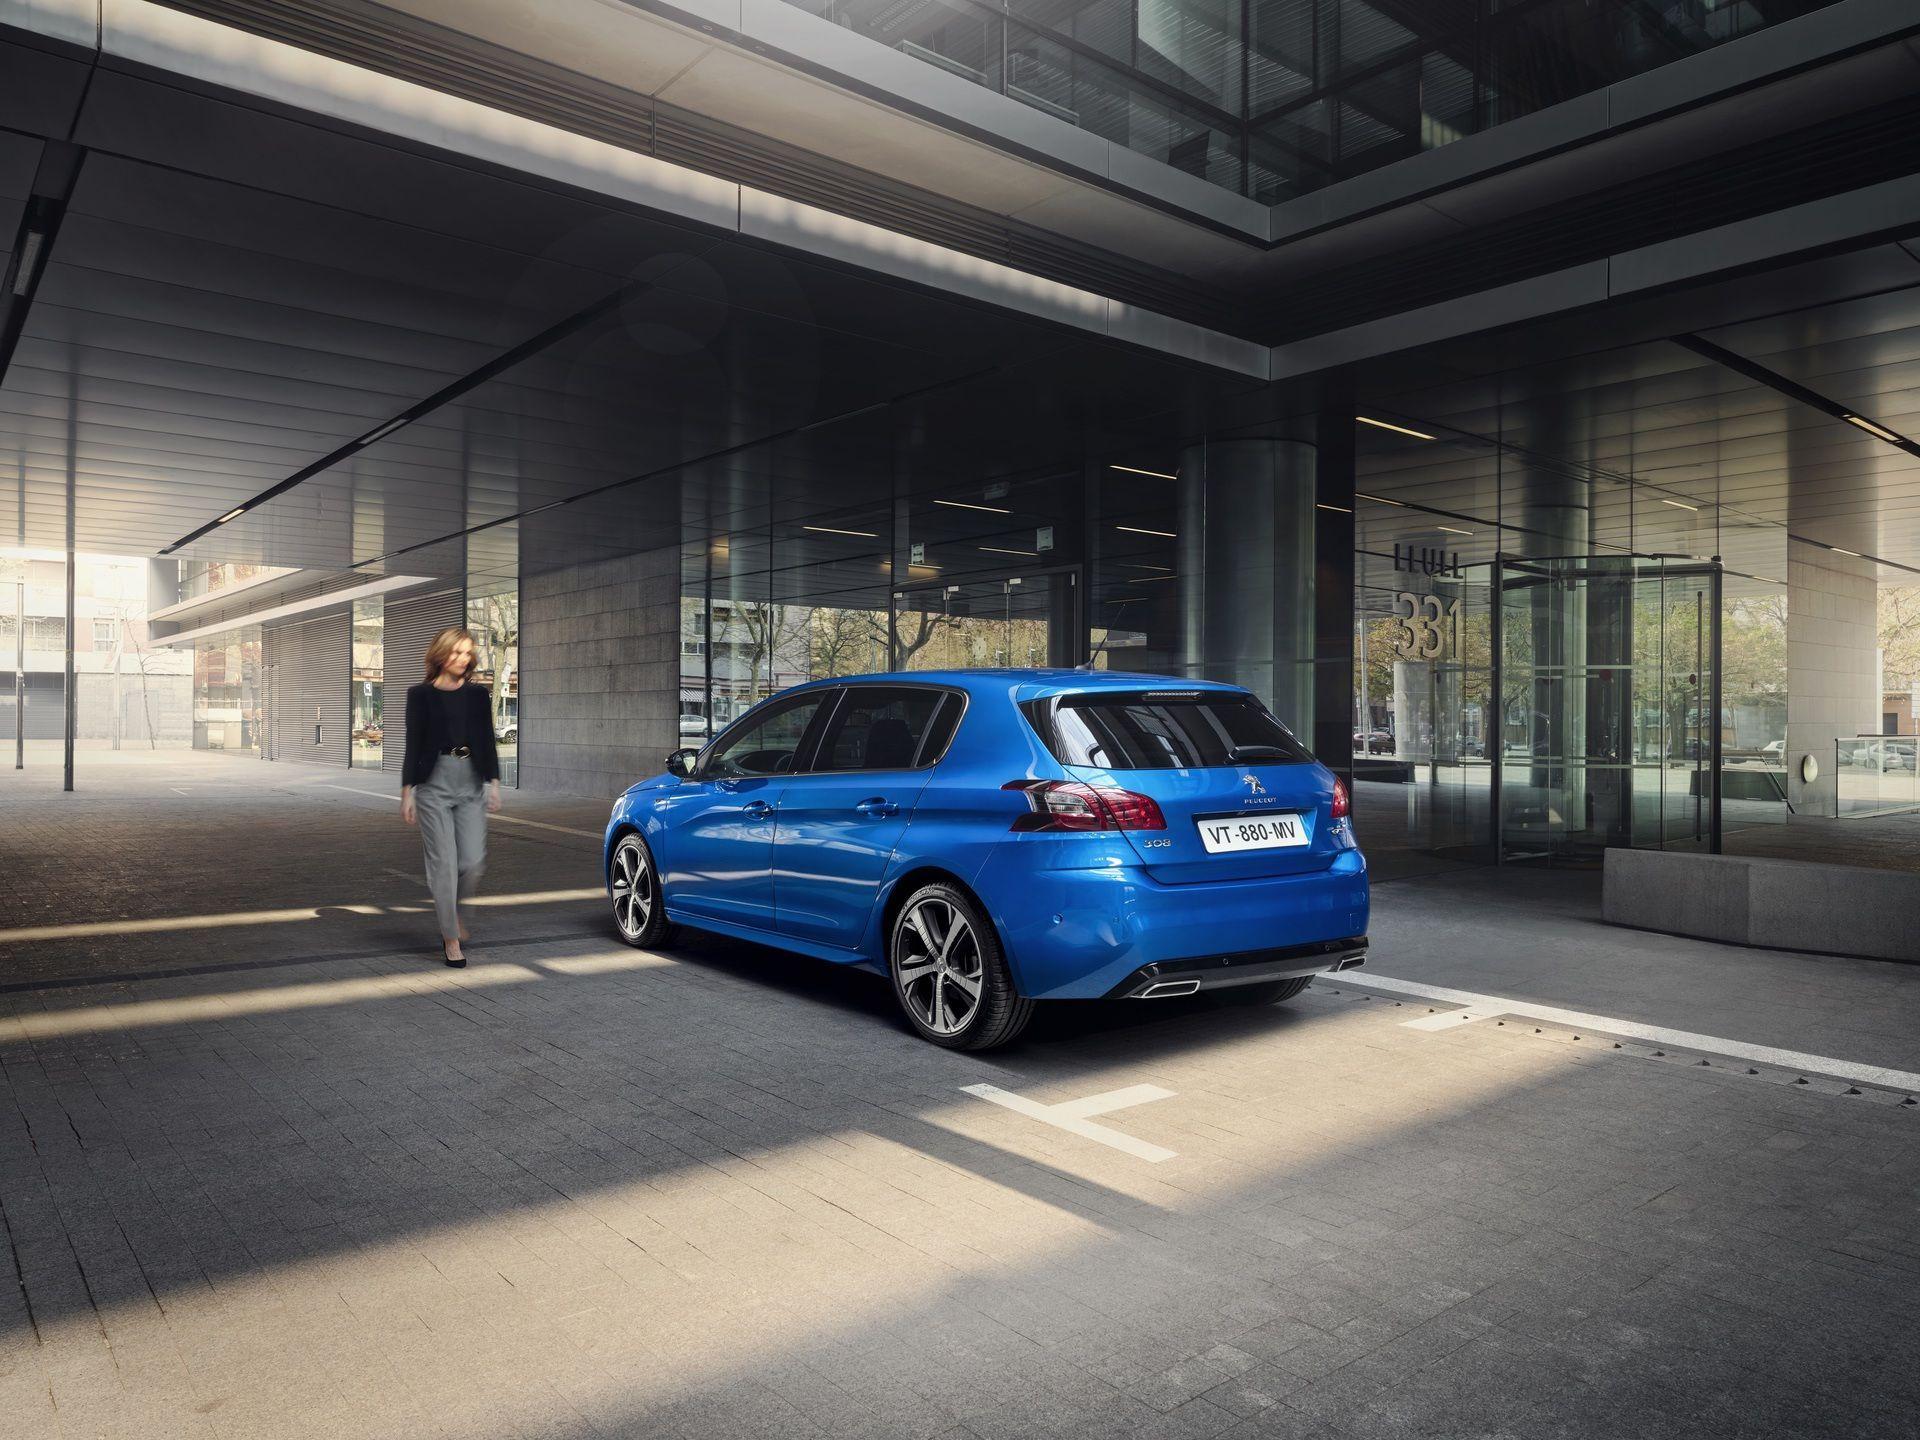 2020_Peugeot_308_facelift_0001